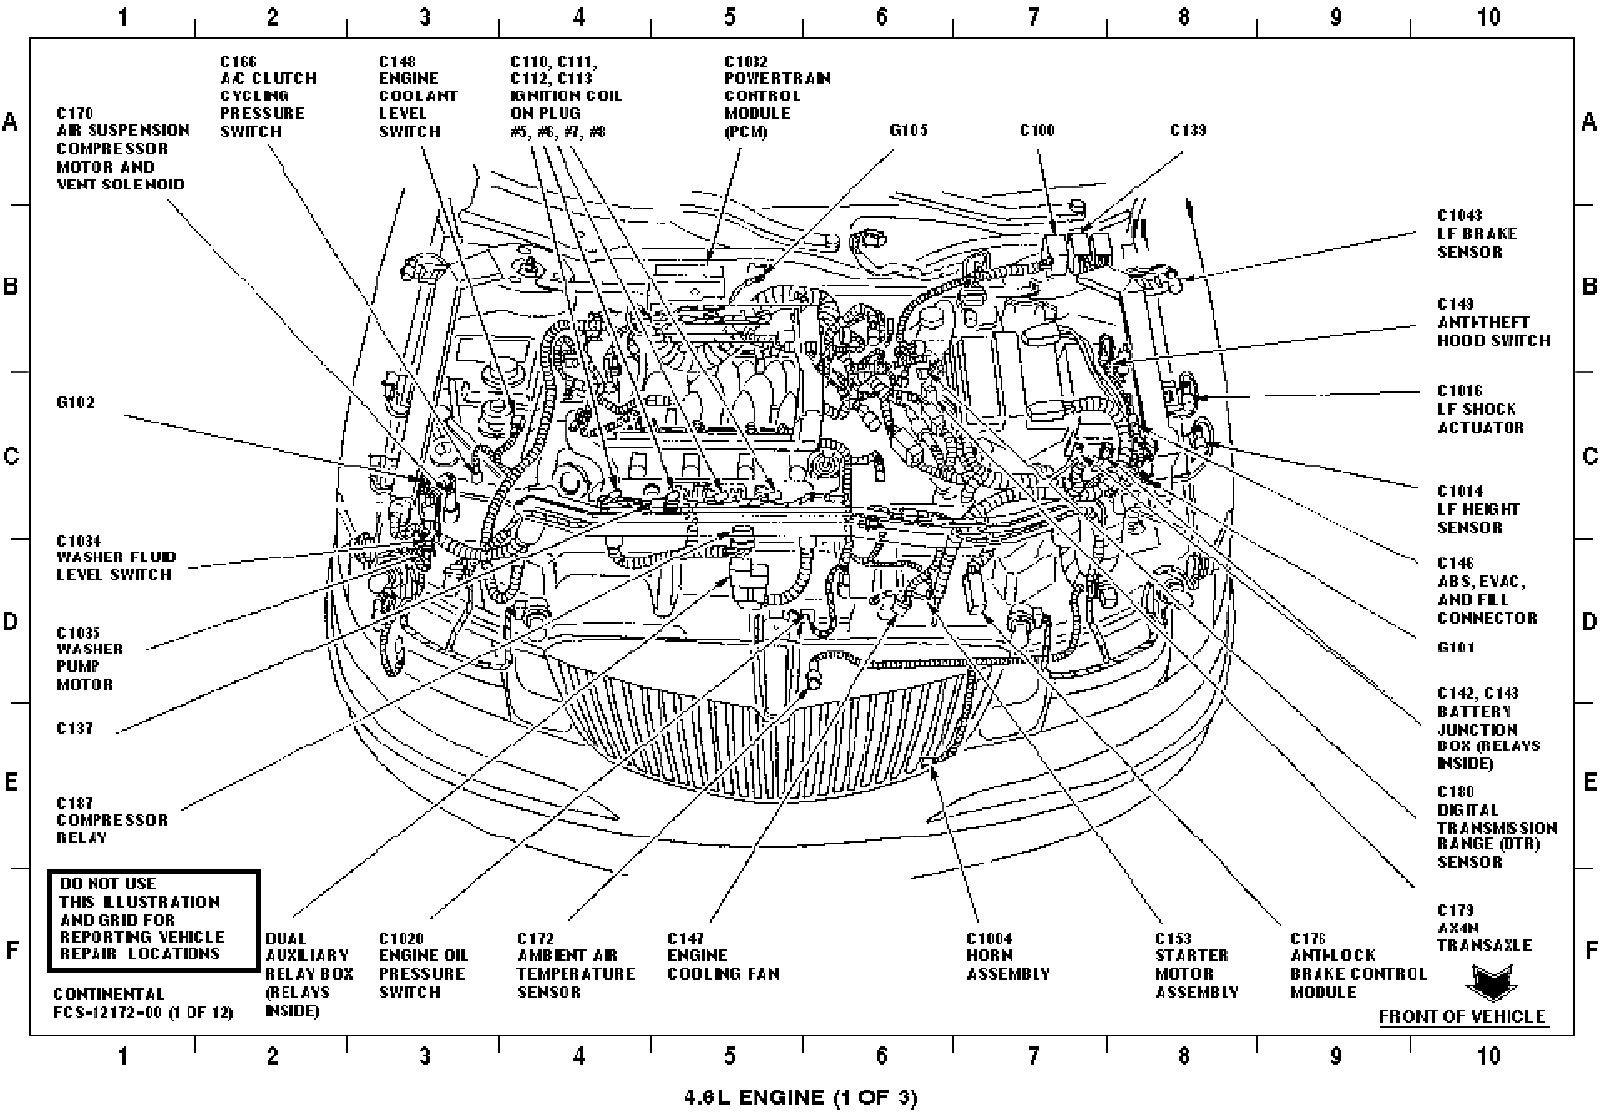 1998 Lincoln Navigator Engine Diagram Wiring Diagram Harsh Espace B Harsh Espace B Ponentefilmfest It